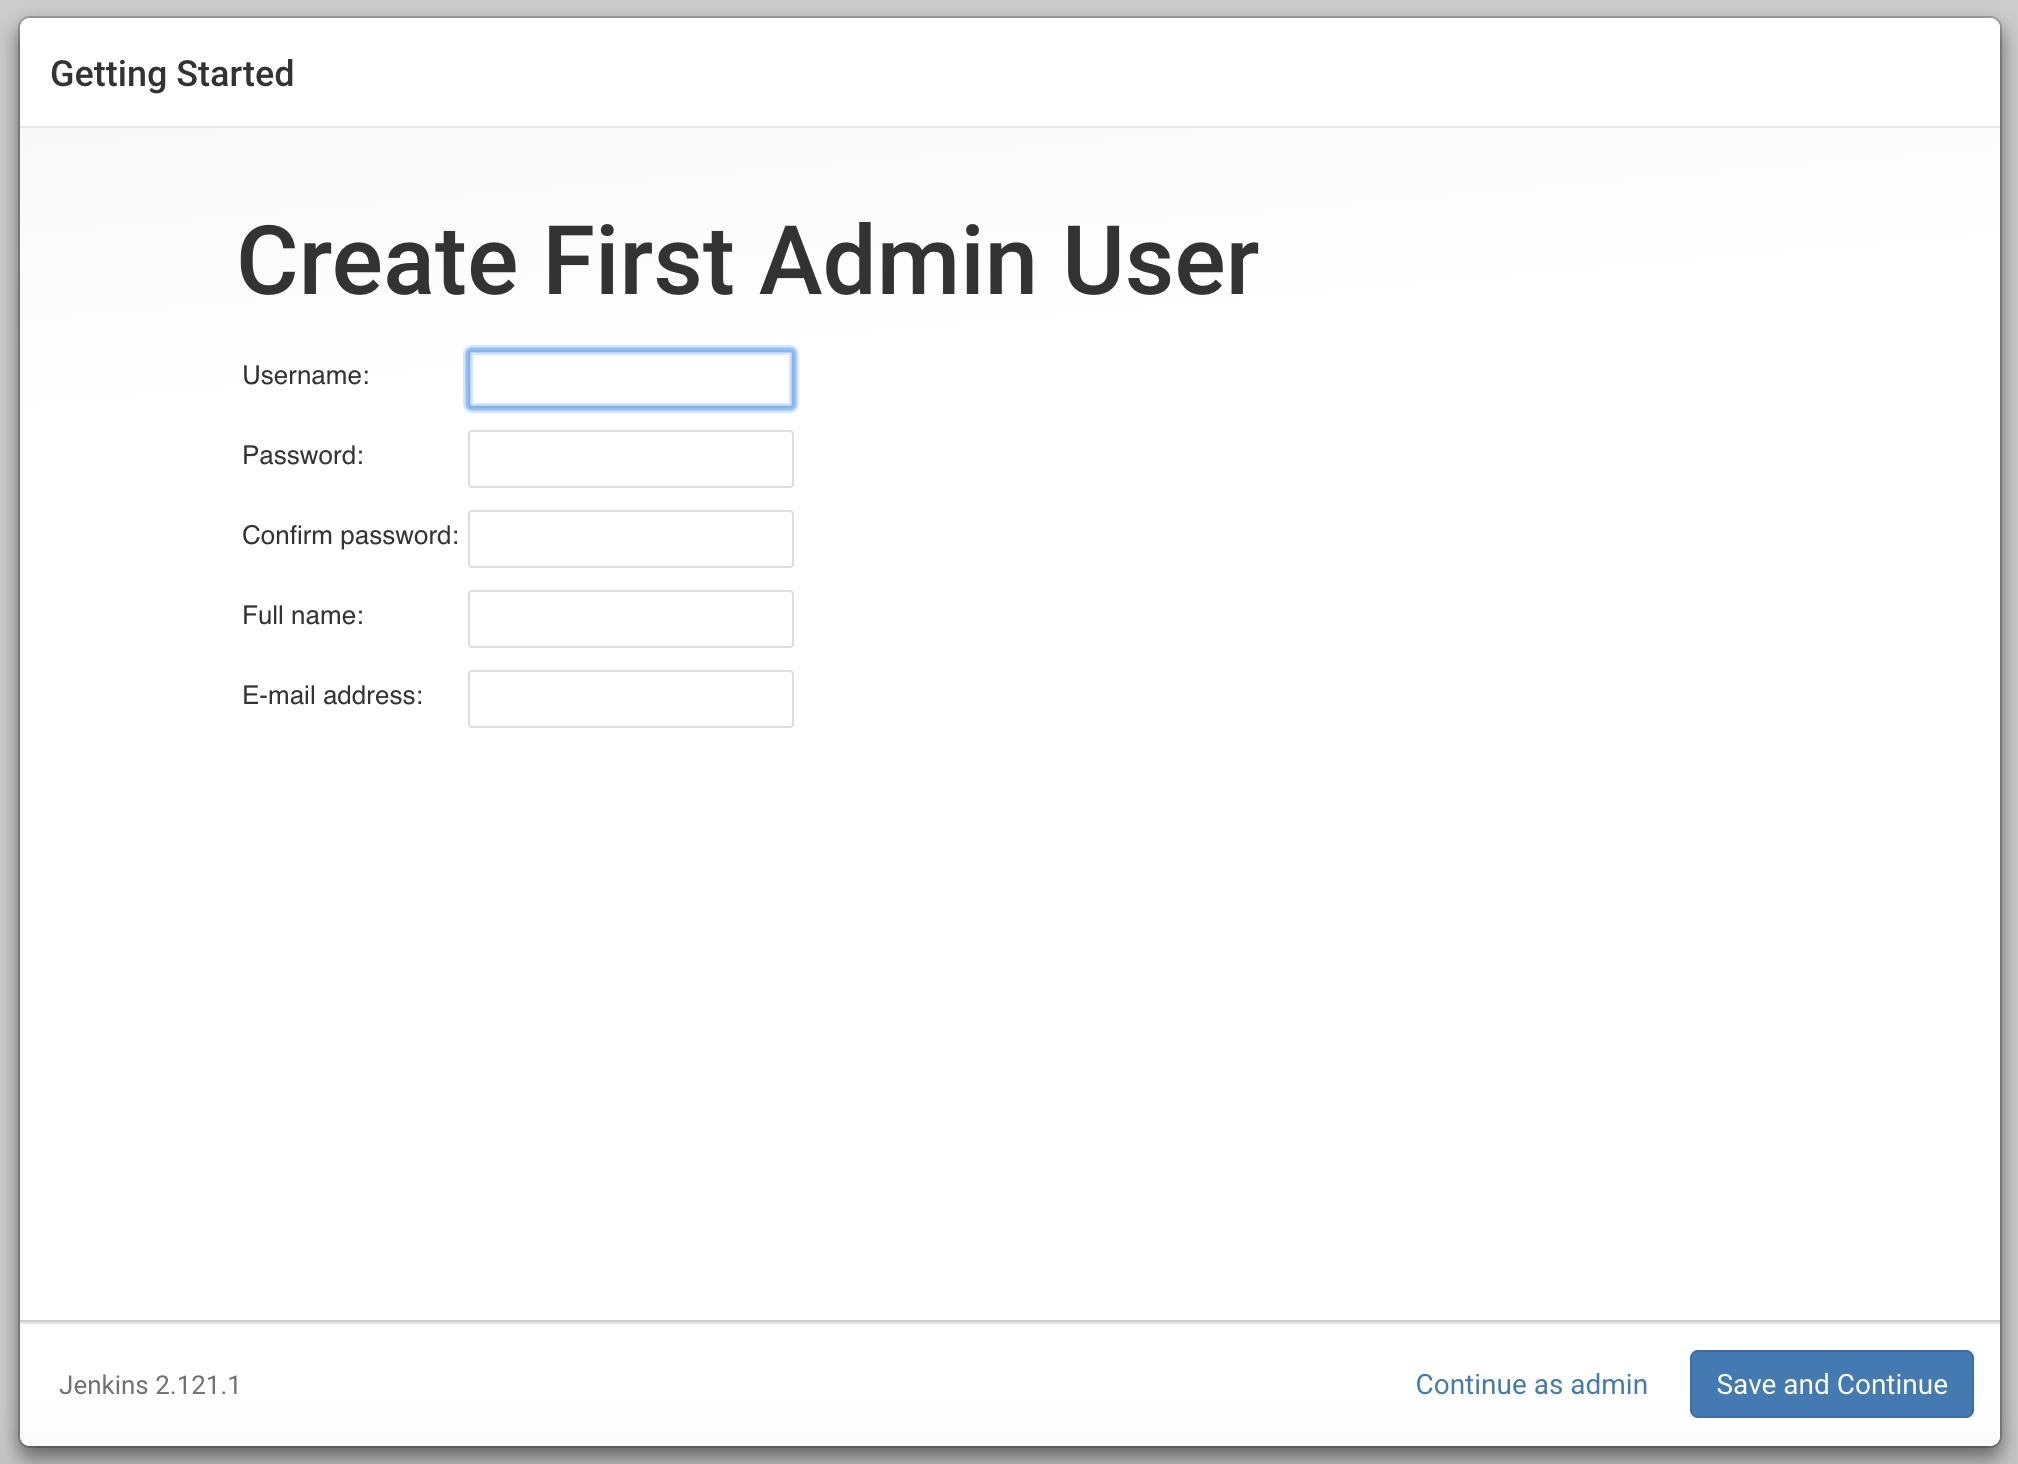 jenkins_create_admin_user